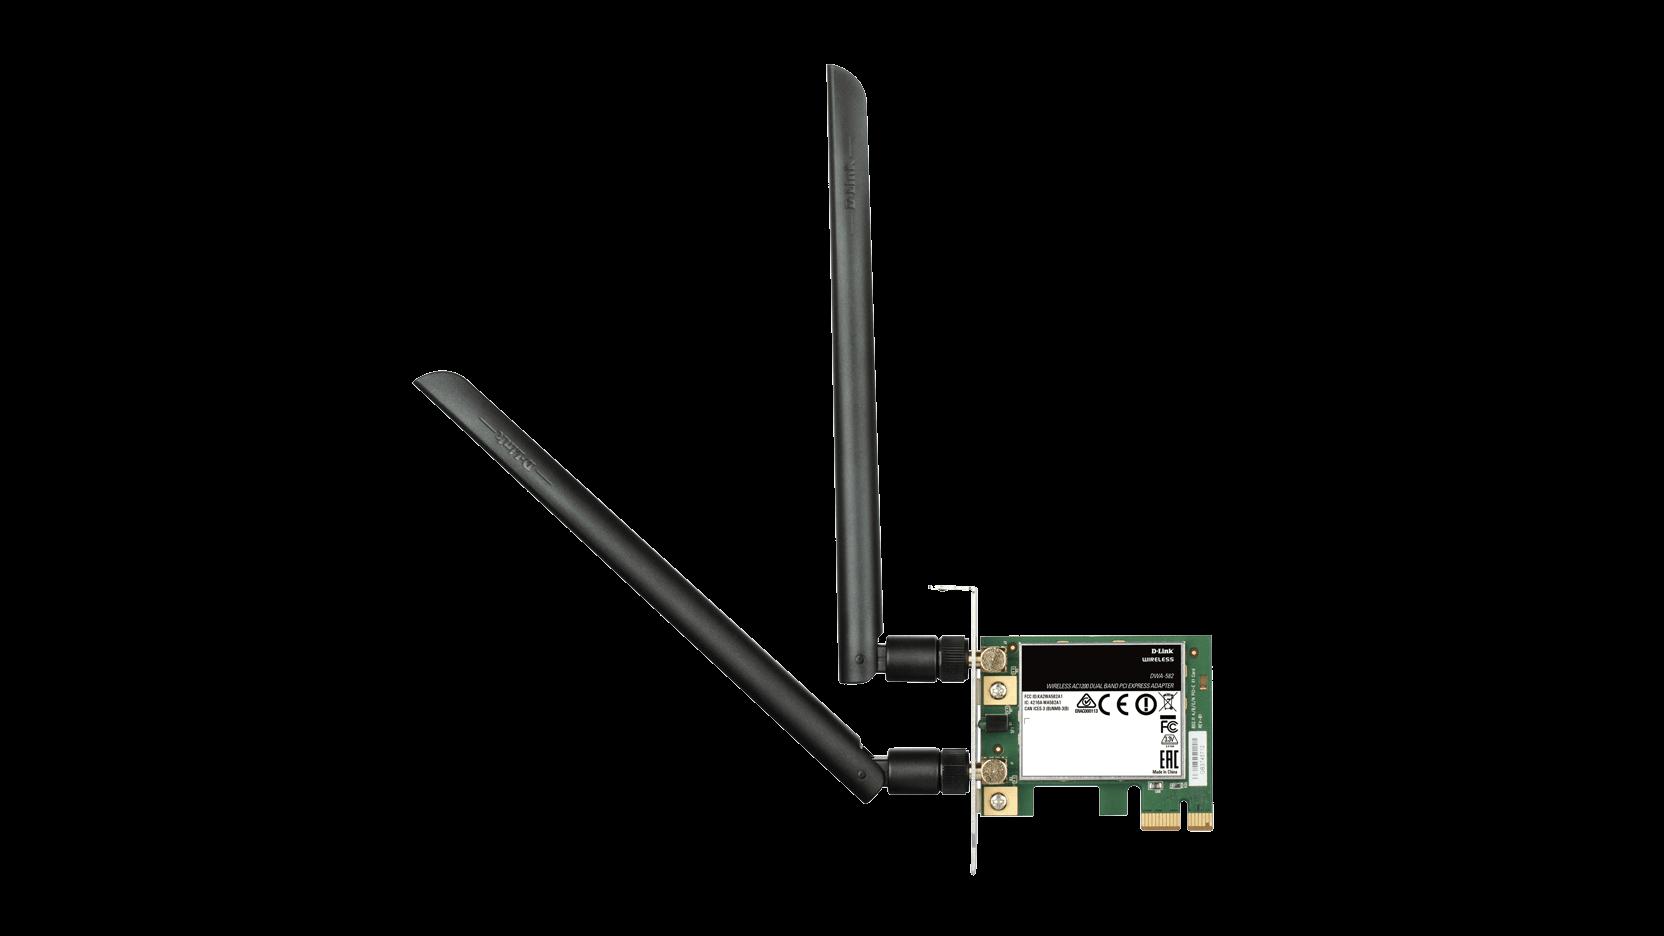 Dir 859 Wireless Ac Dual Band Gigabit Router